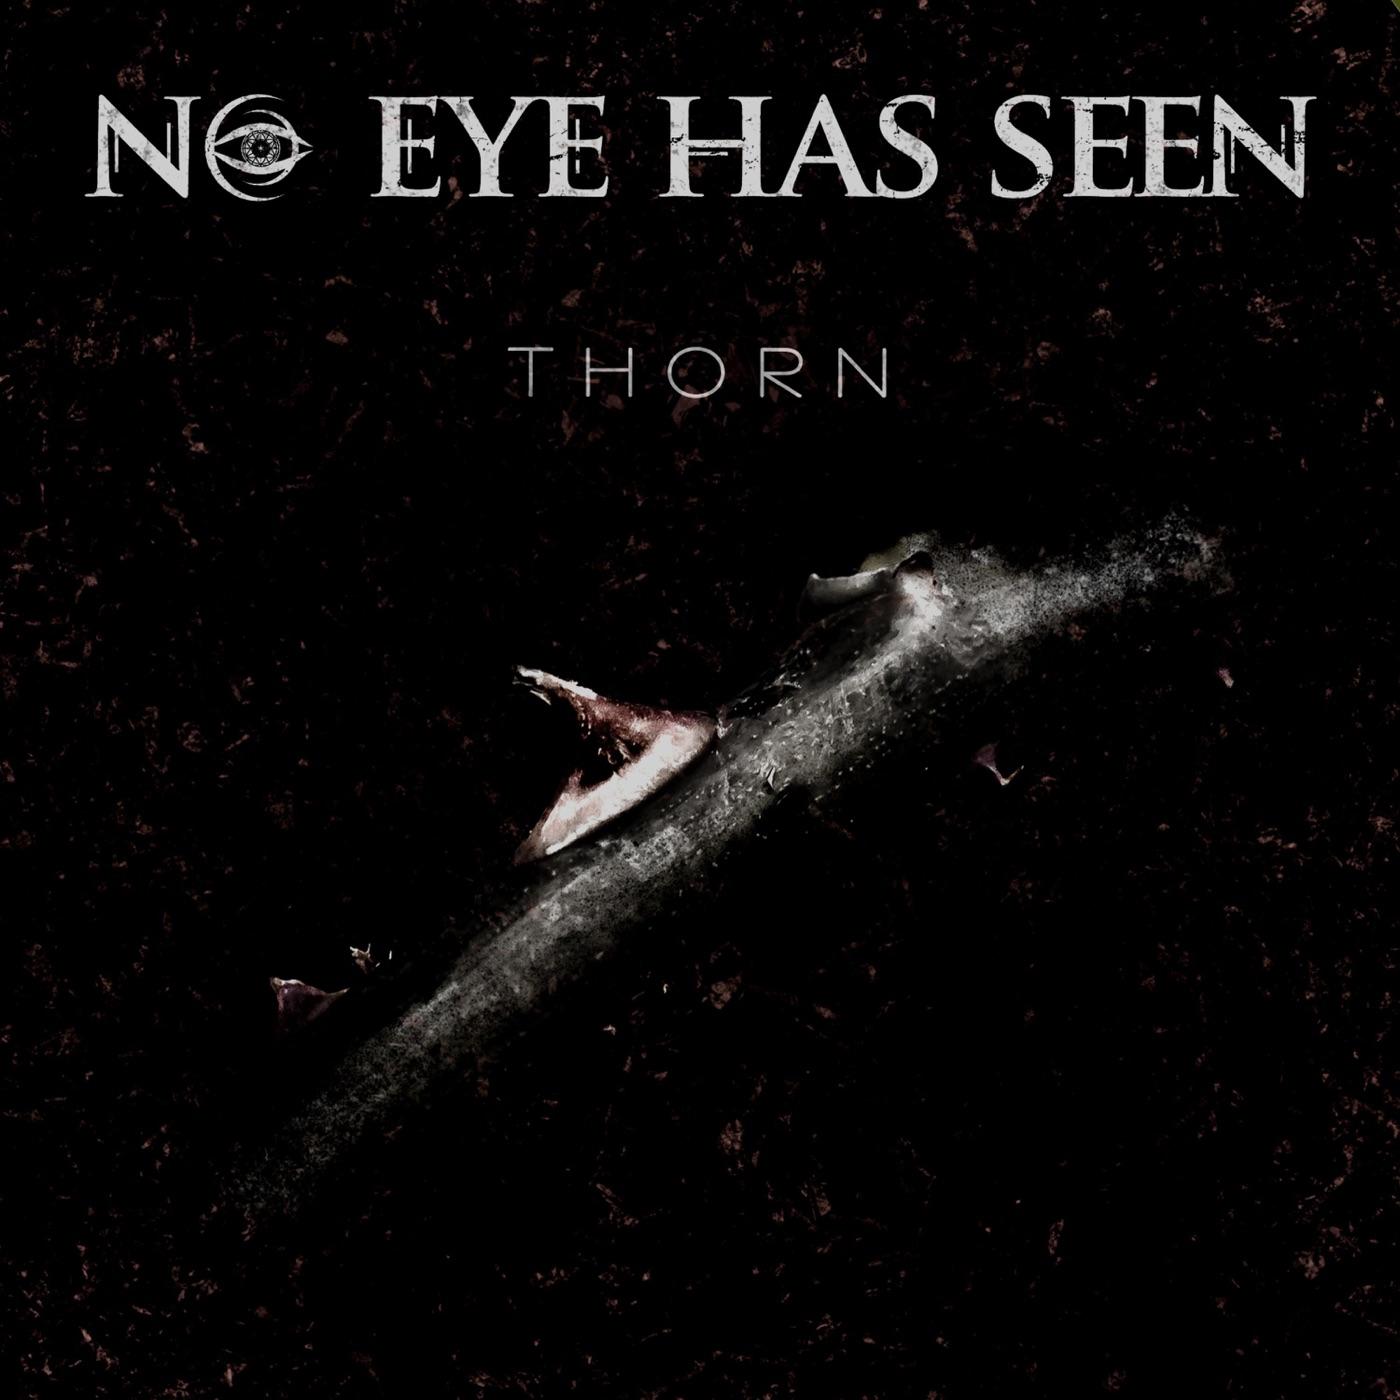 No Eye Has Seen - Thorn [single] (2019)